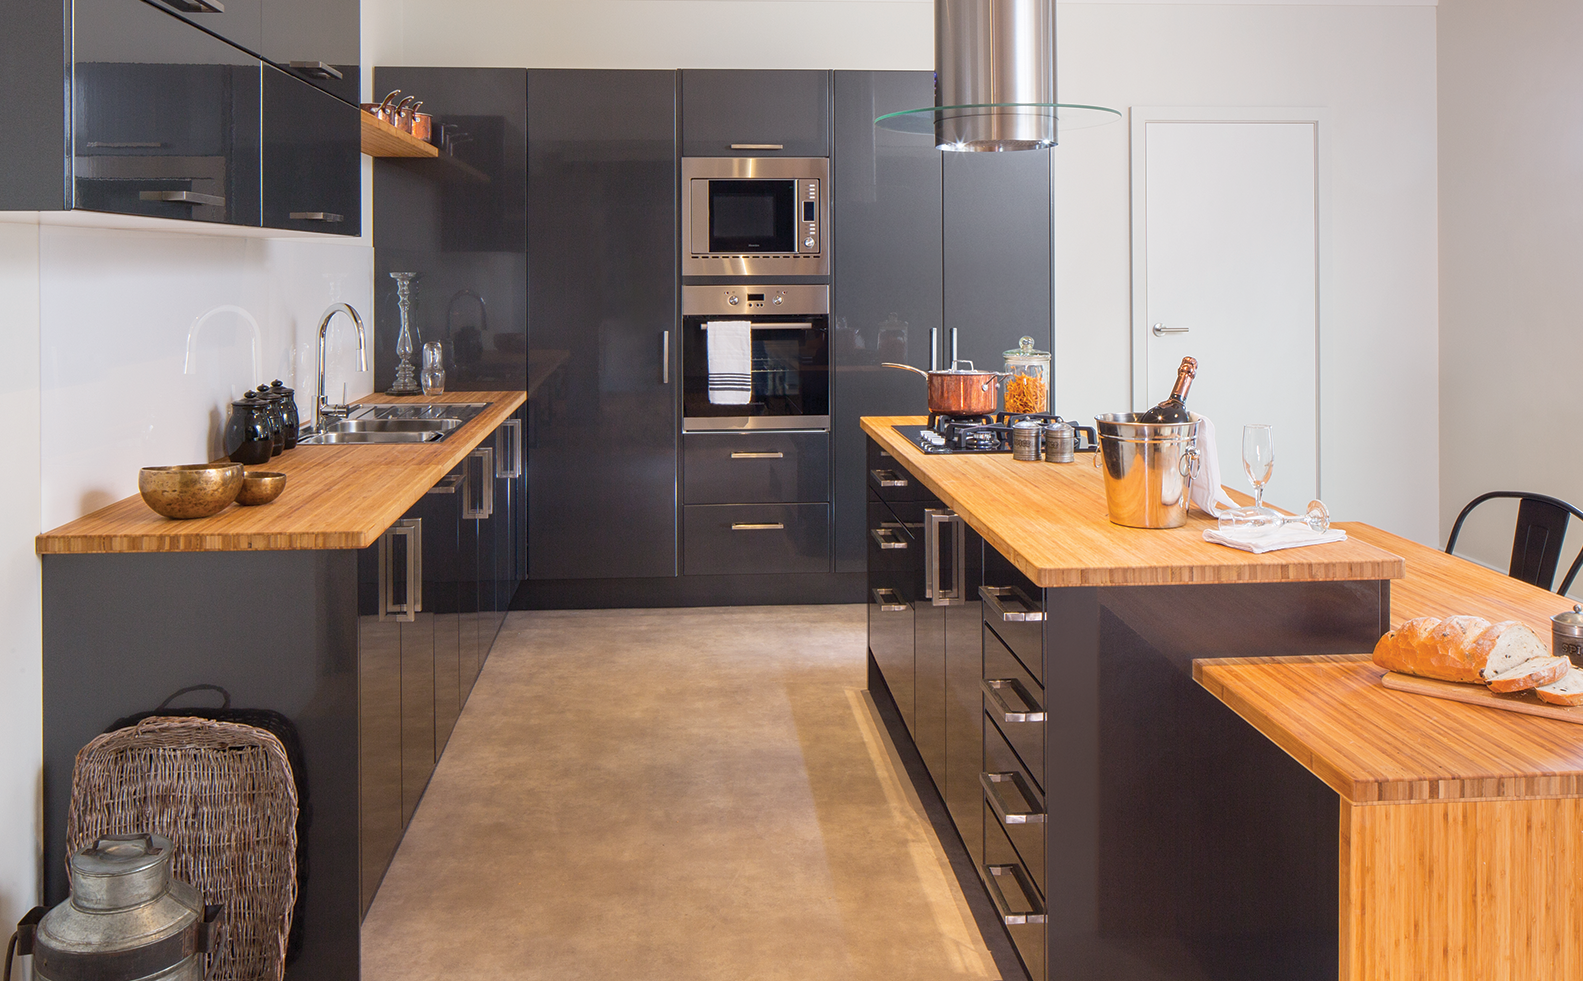 layout ideas kitchen inspiration gallery bunnings warehouse kitchen inspirations stylish on kaboodle kitchen design id=25361